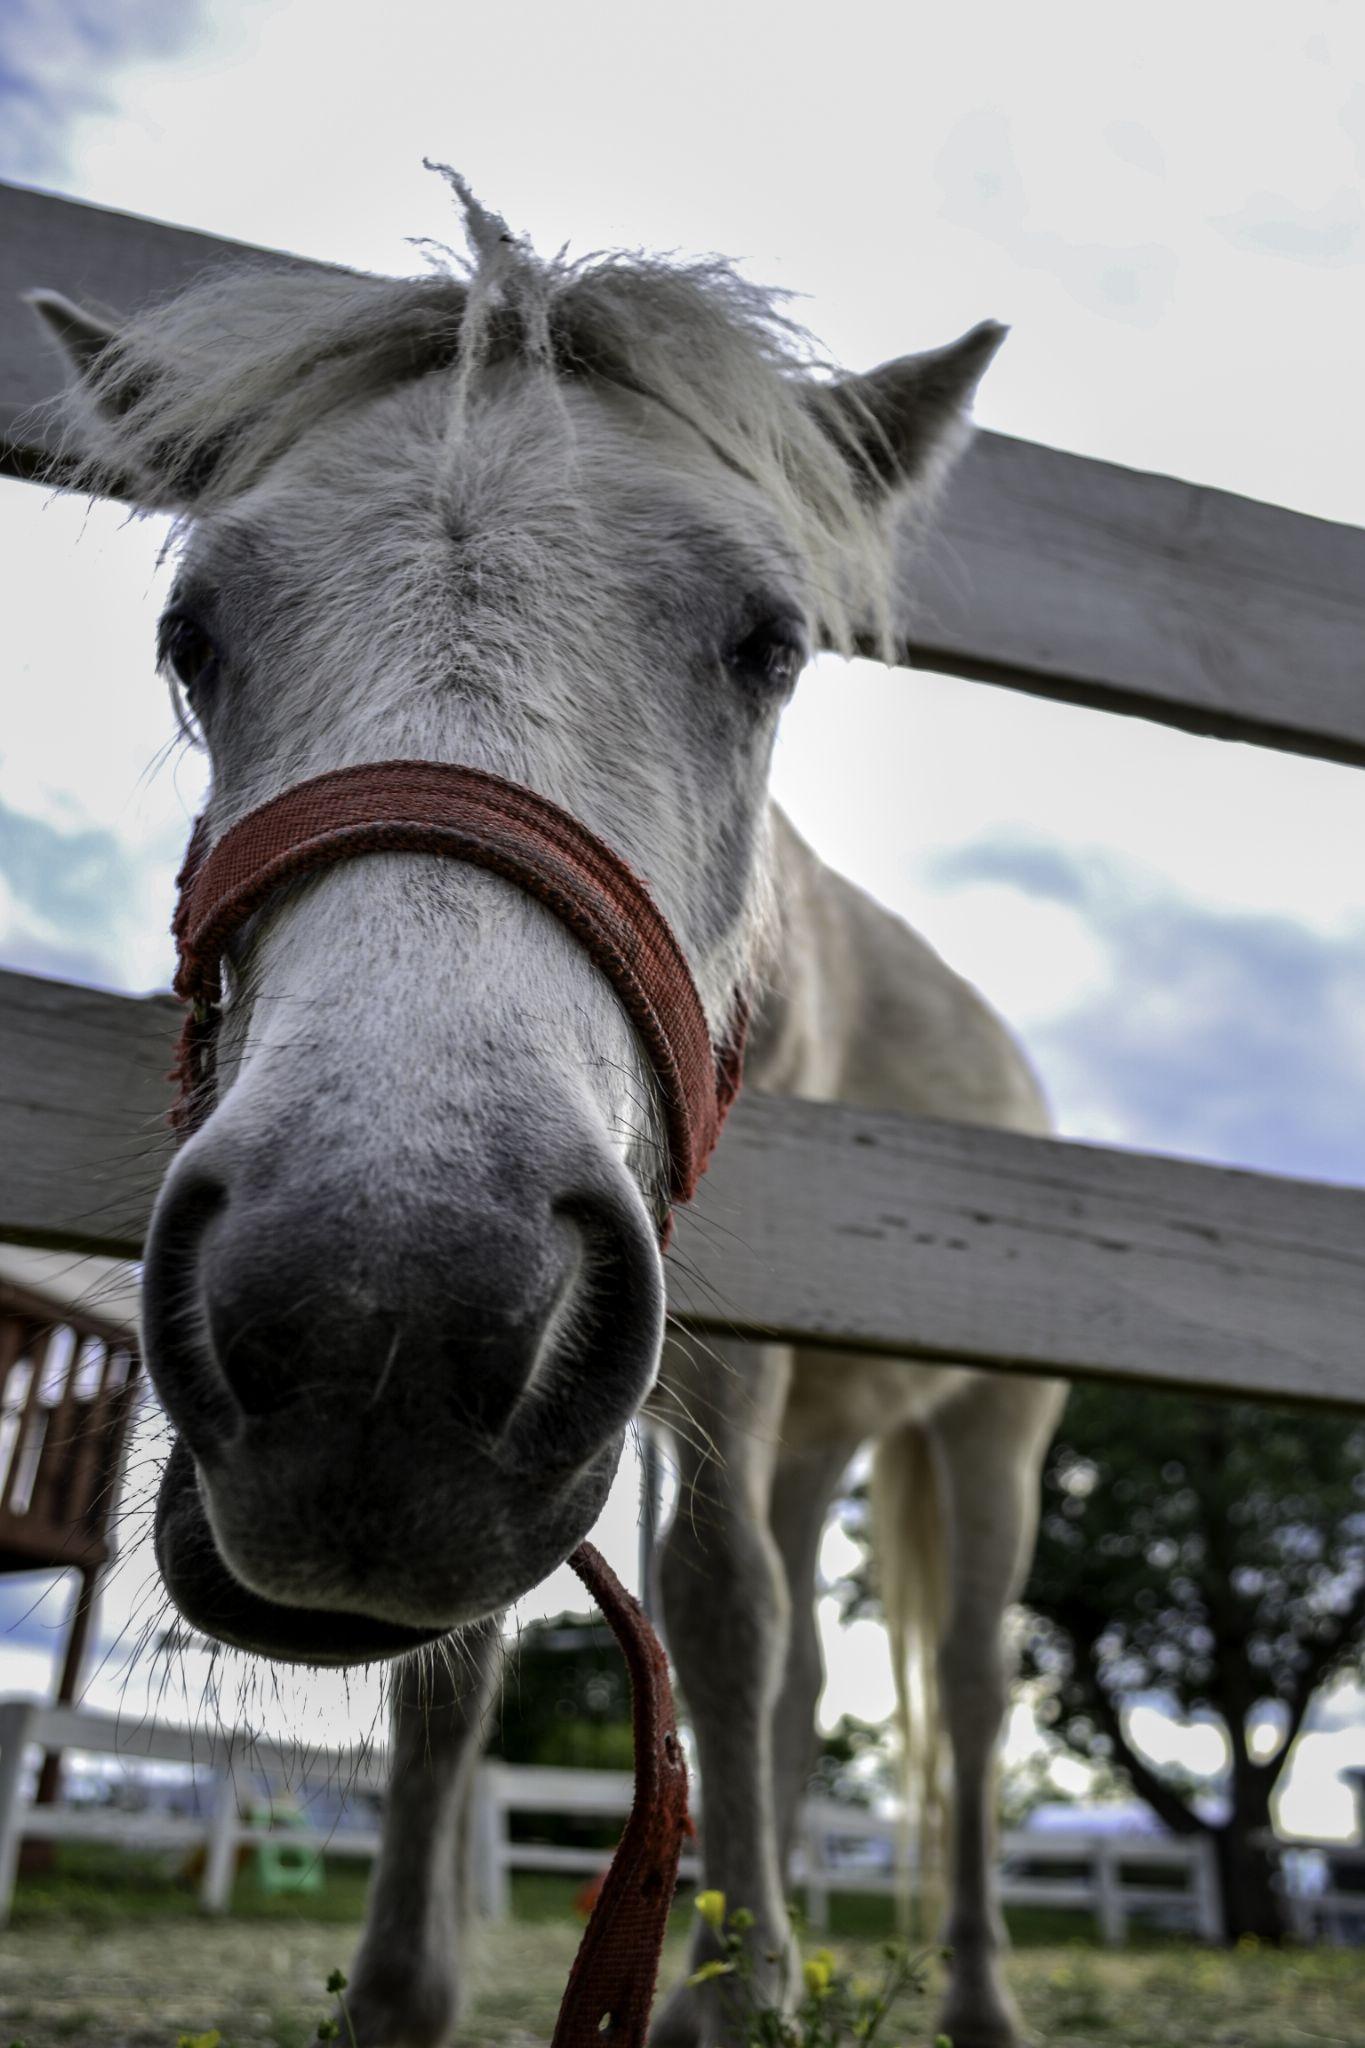 horse by jure kralj